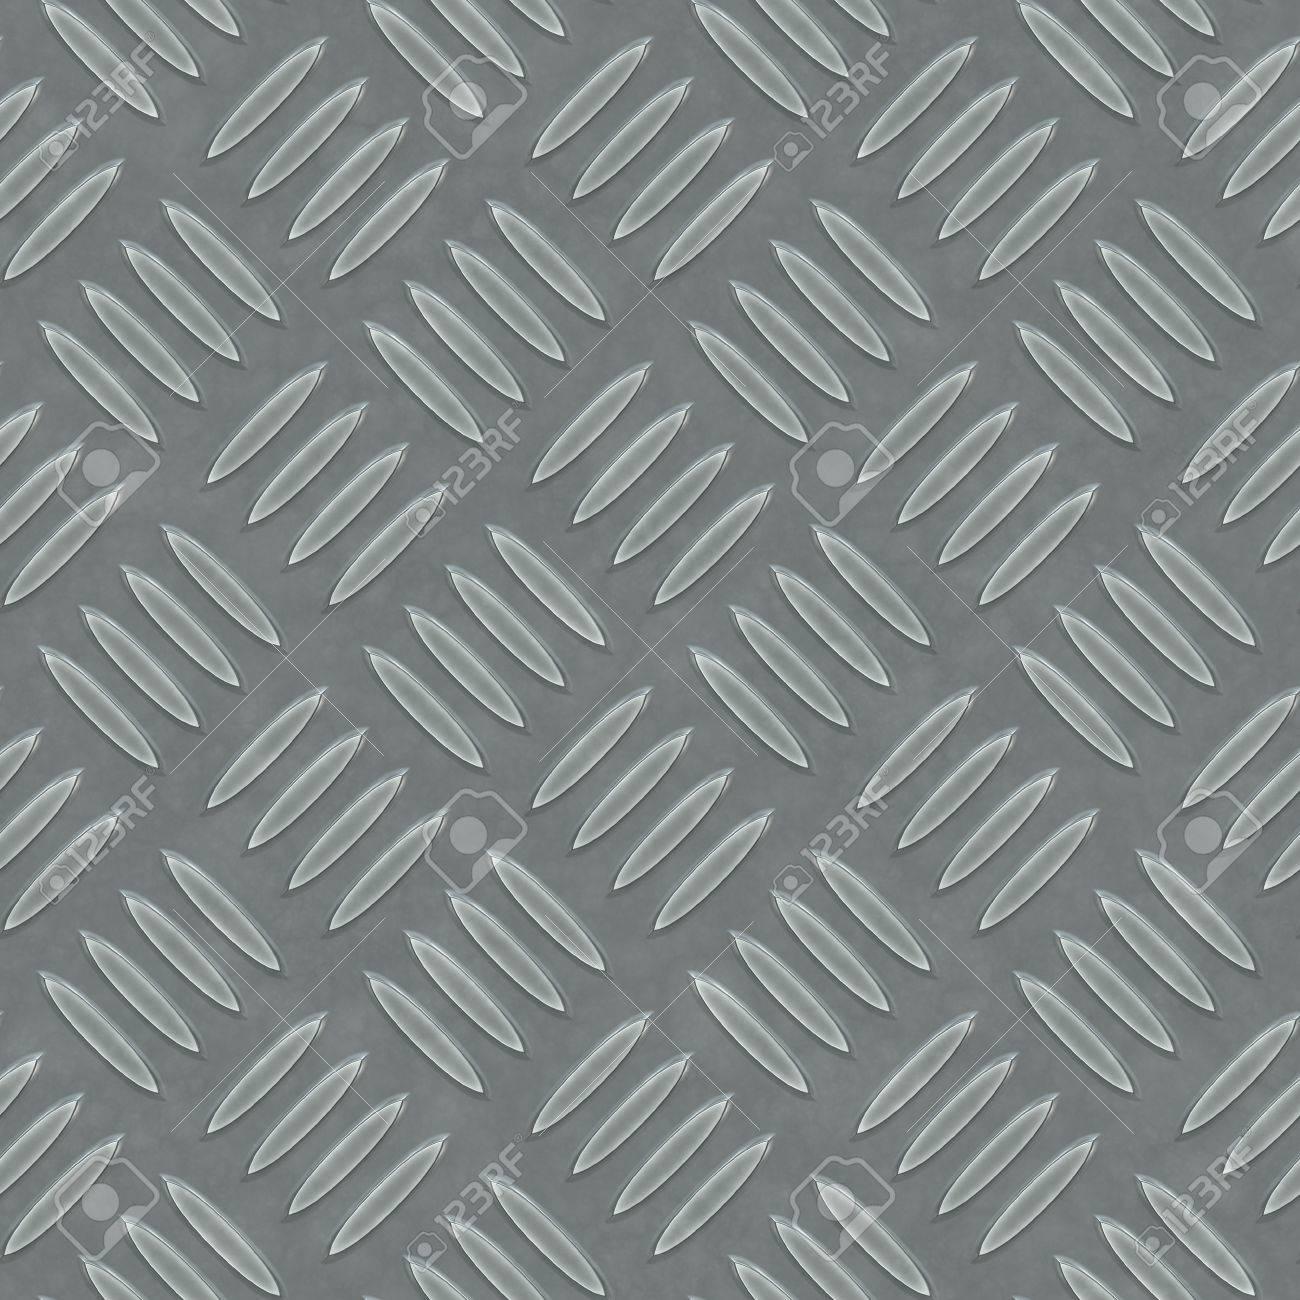 Metal Plate Texture Parfu Kaptanband Co